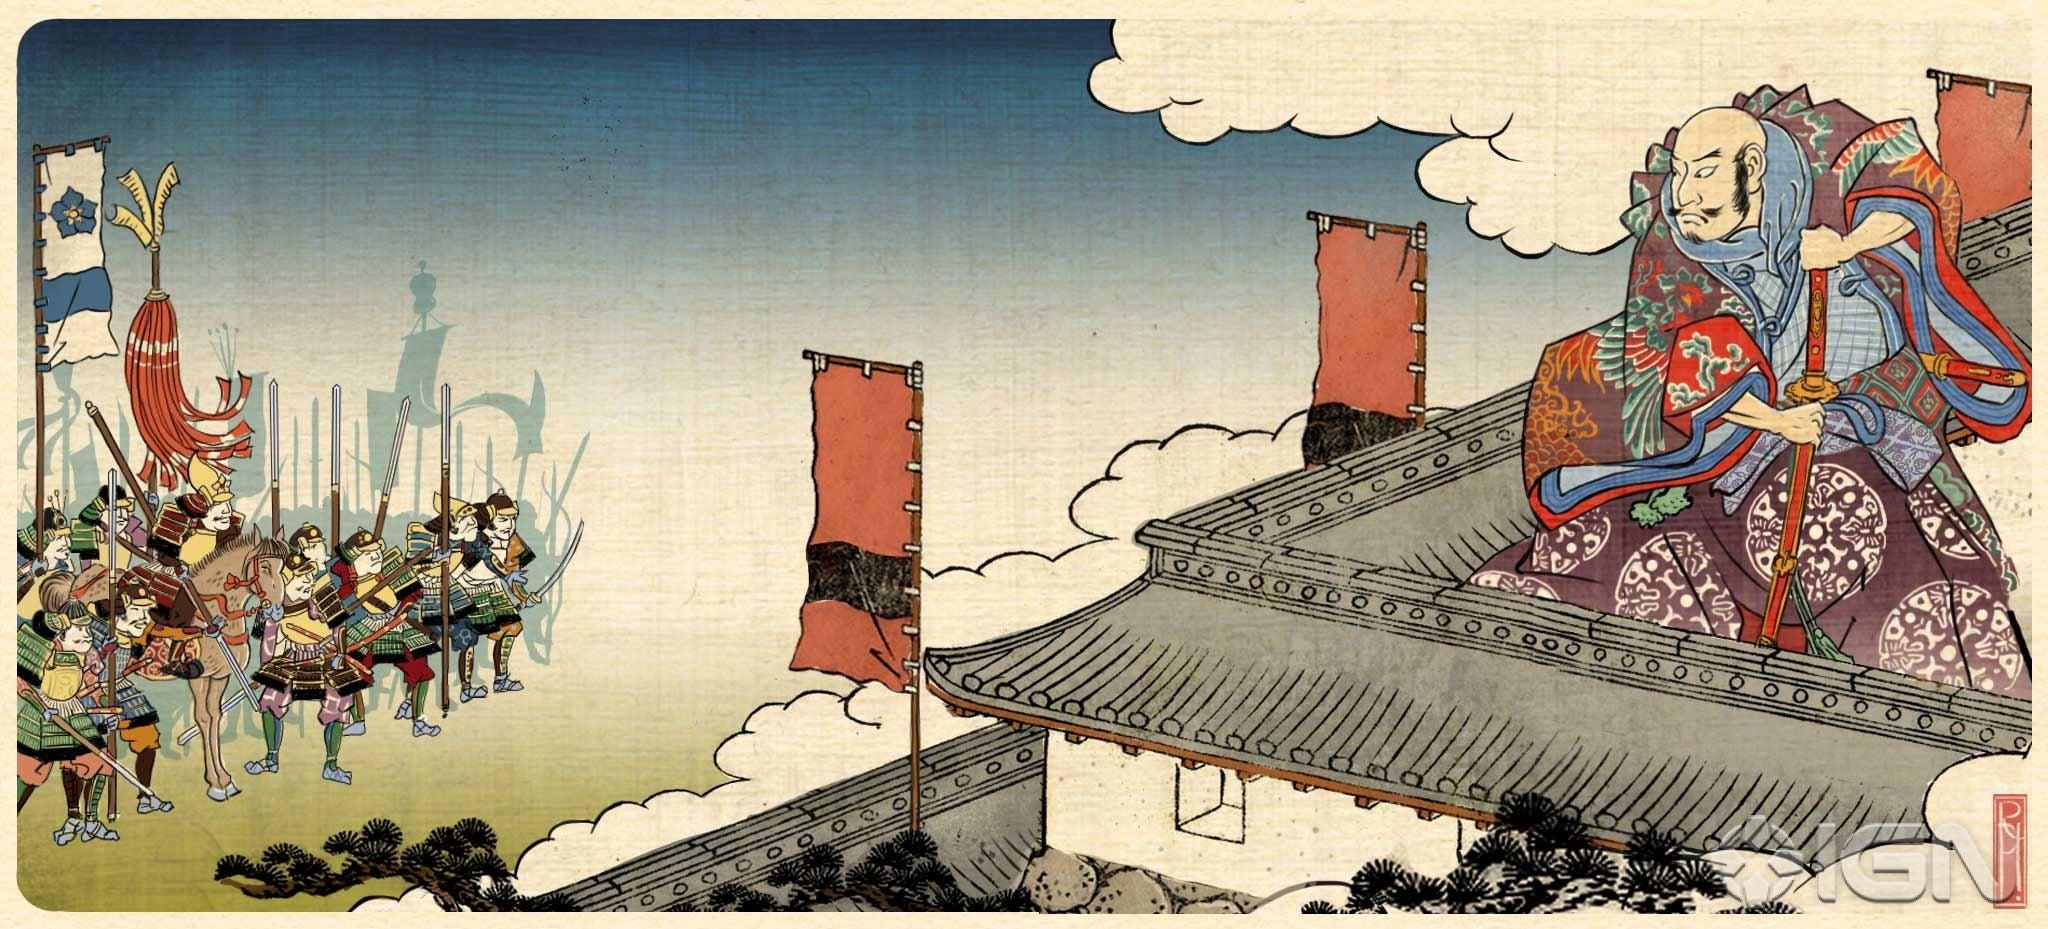 Total War Shogun 2 Fall Of The Samurai Wallpaper Total War Shogun 2 Rise Of The Samurai Dlc Out 27 09